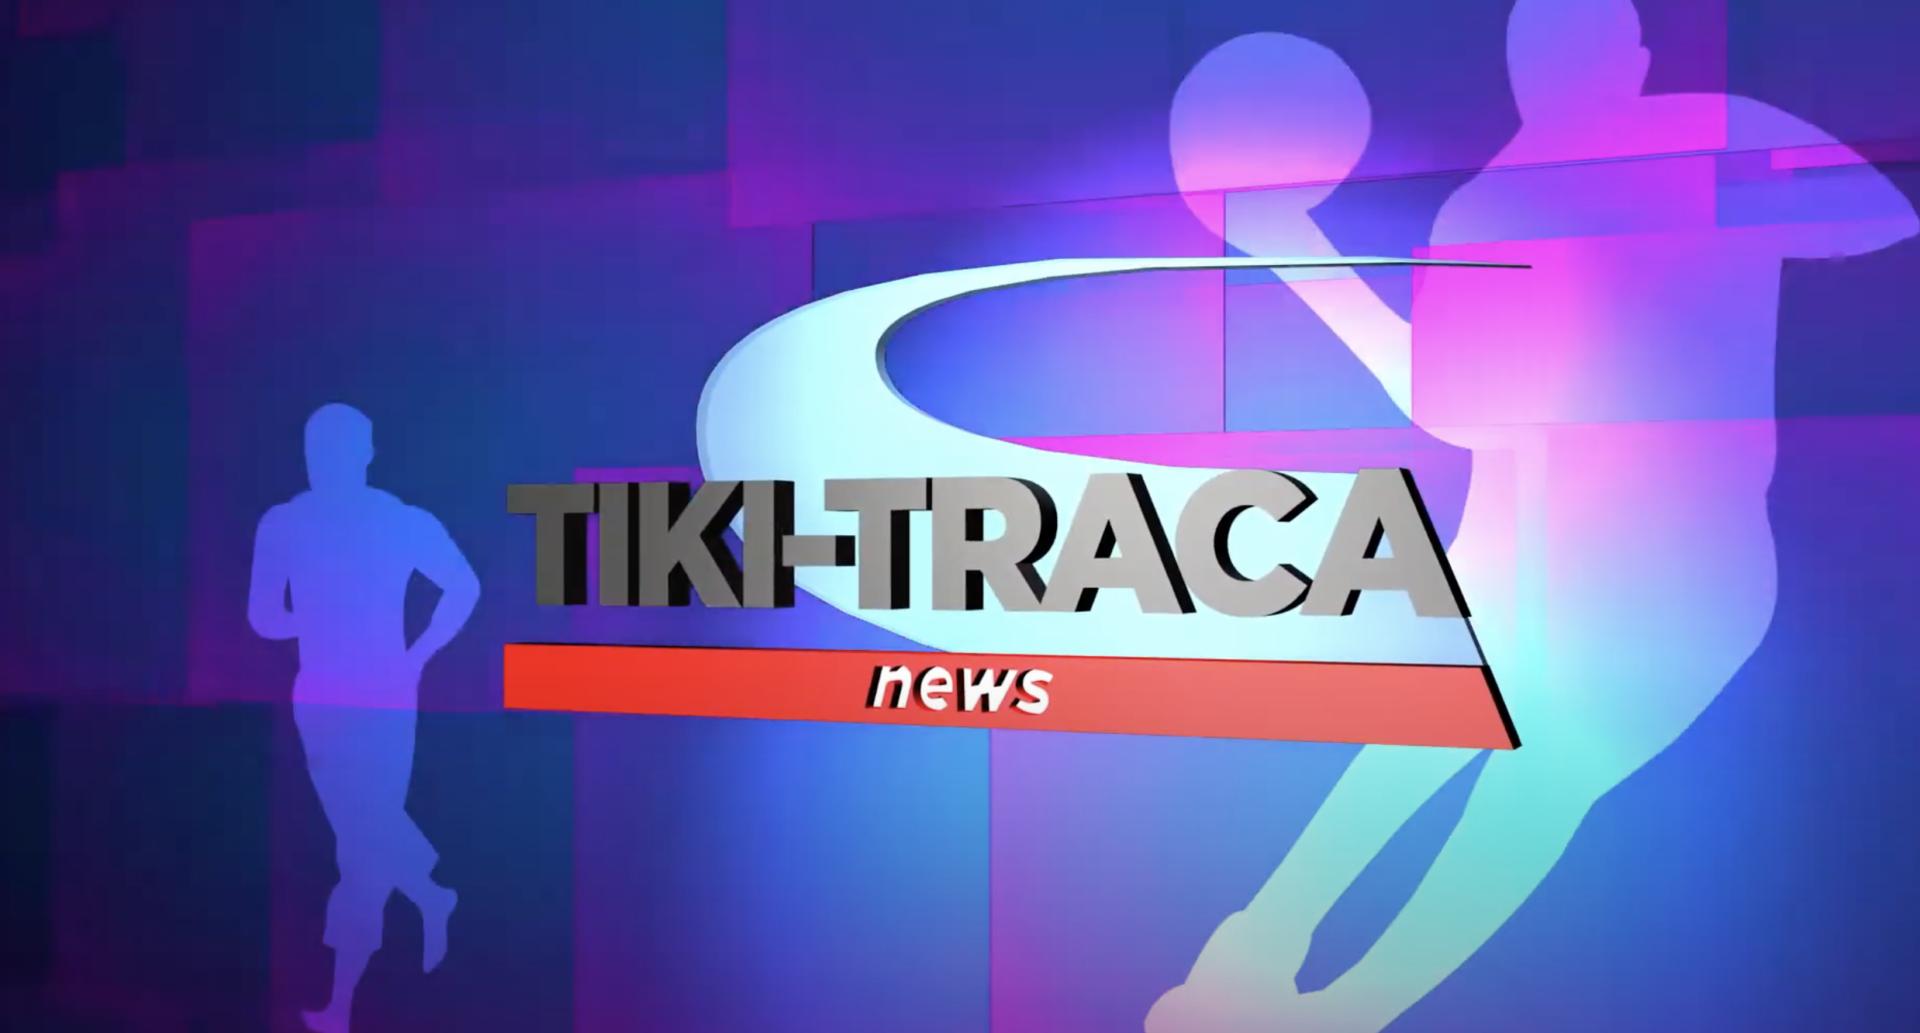 tikitrakanews-informativo-comedia-caroltomás-ukpikproductions